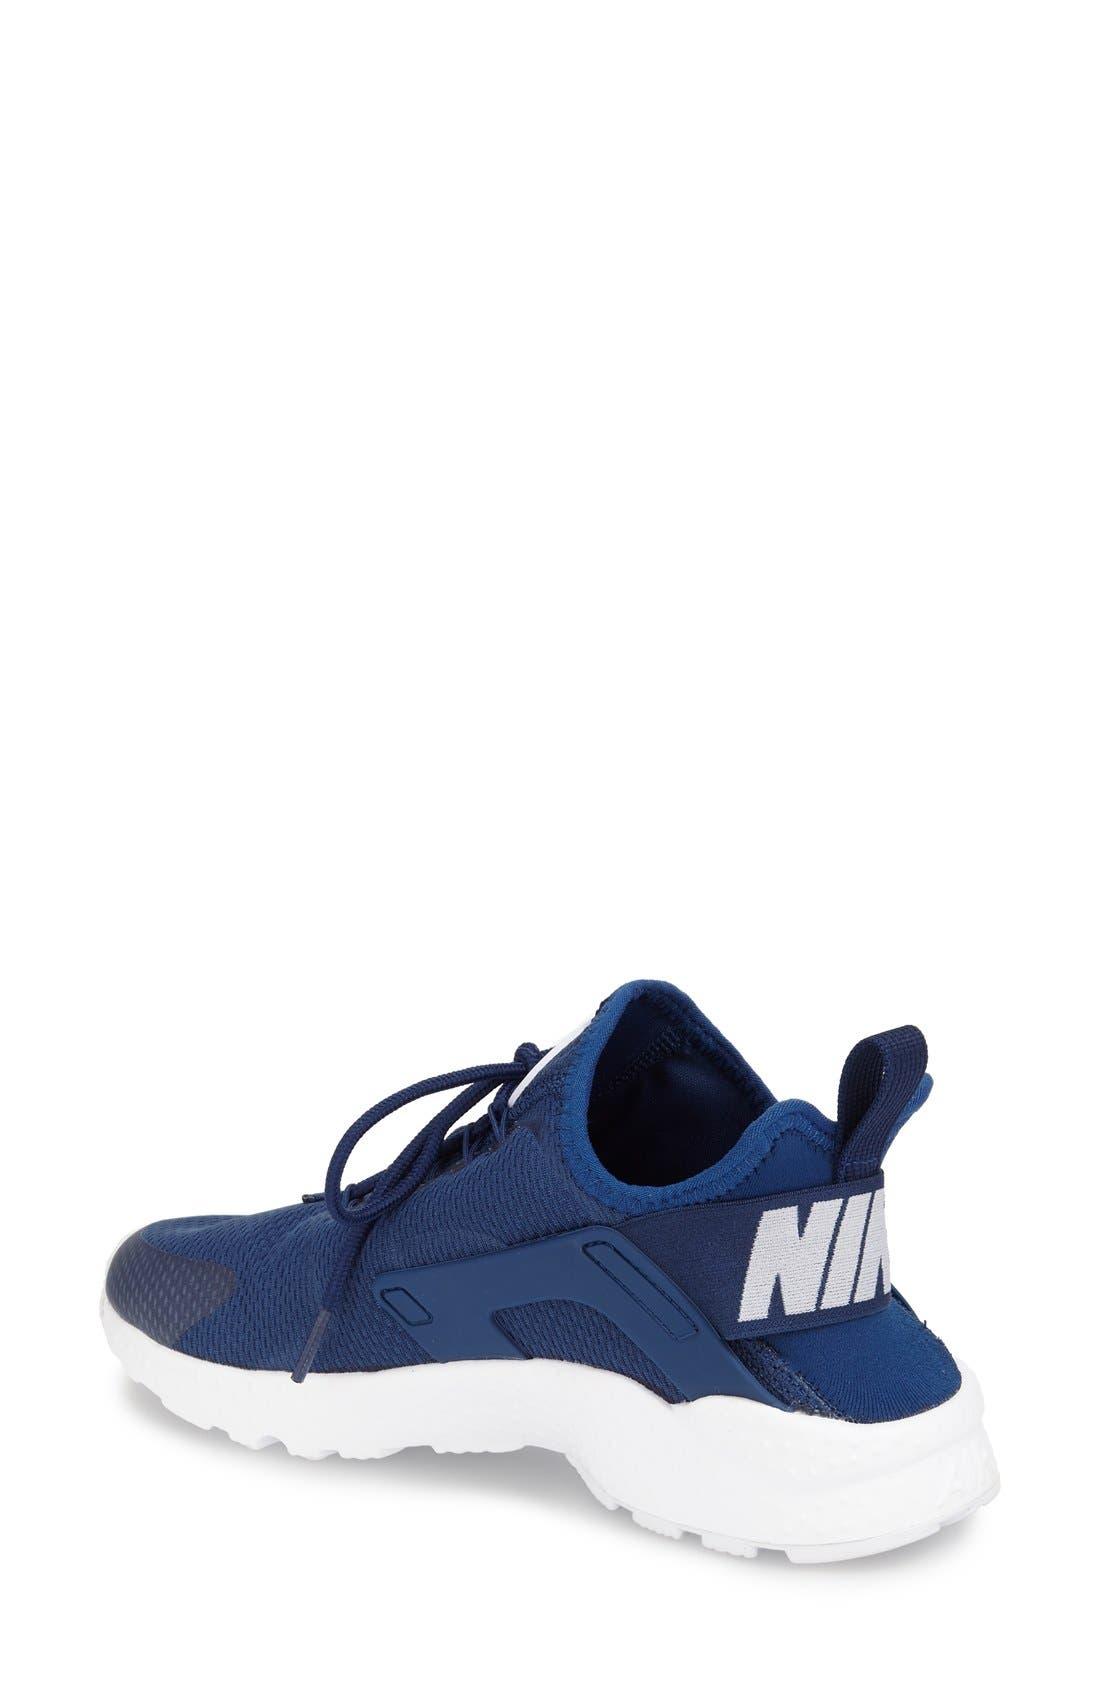 Air Huarache Sneaker,                             Alternate thumbnail 69, color,